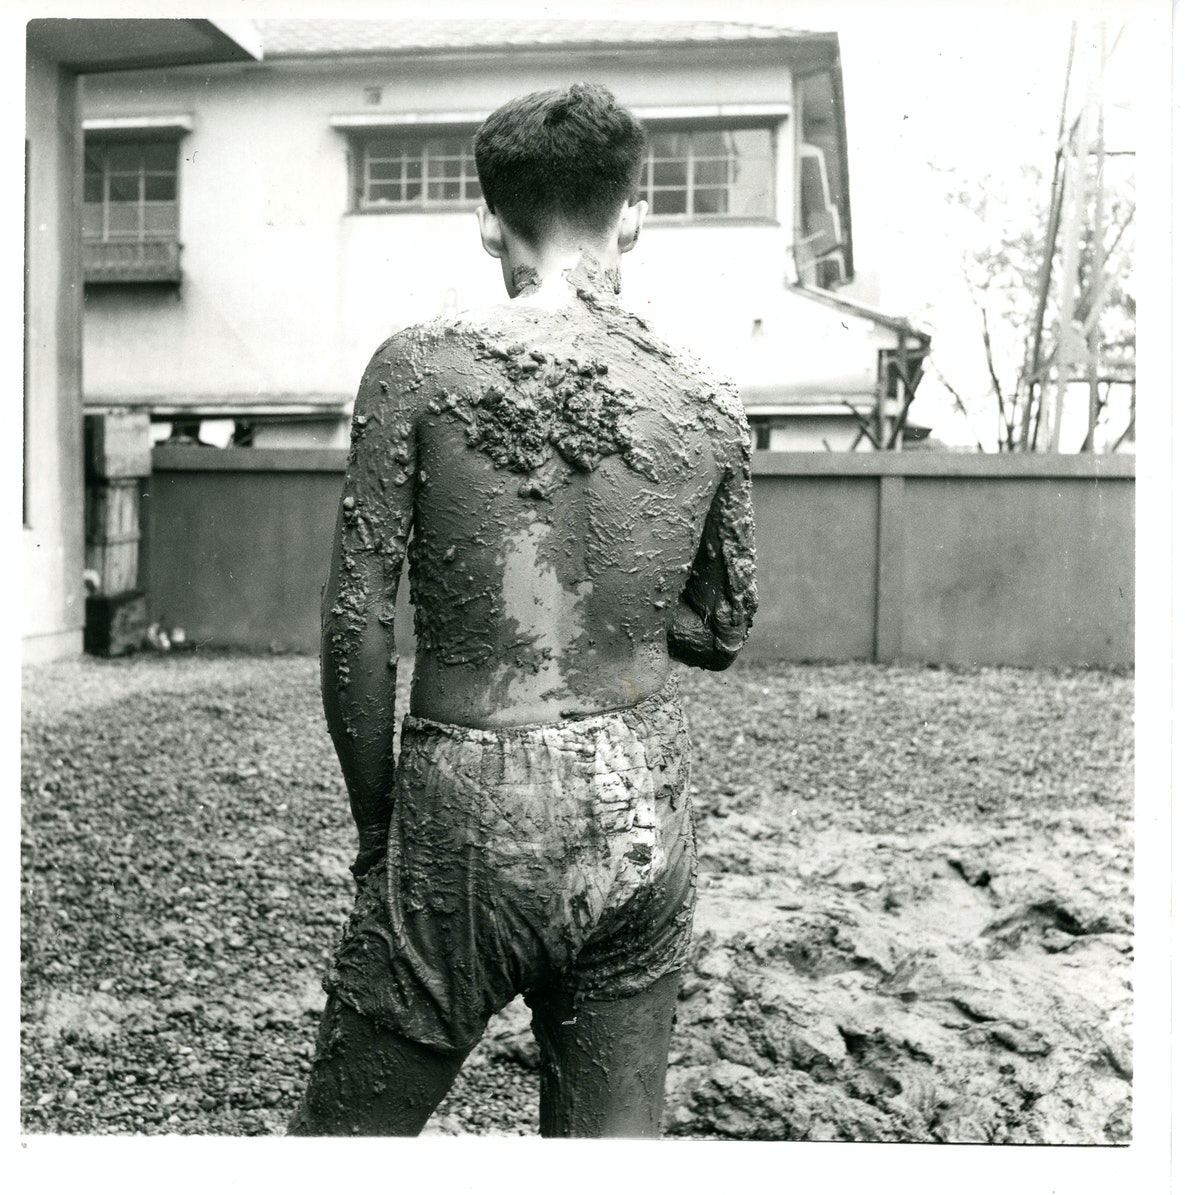 Kazuo Shiraga, Challenging Mud (third execution), 1955, 1st Gutai Art Exhibition